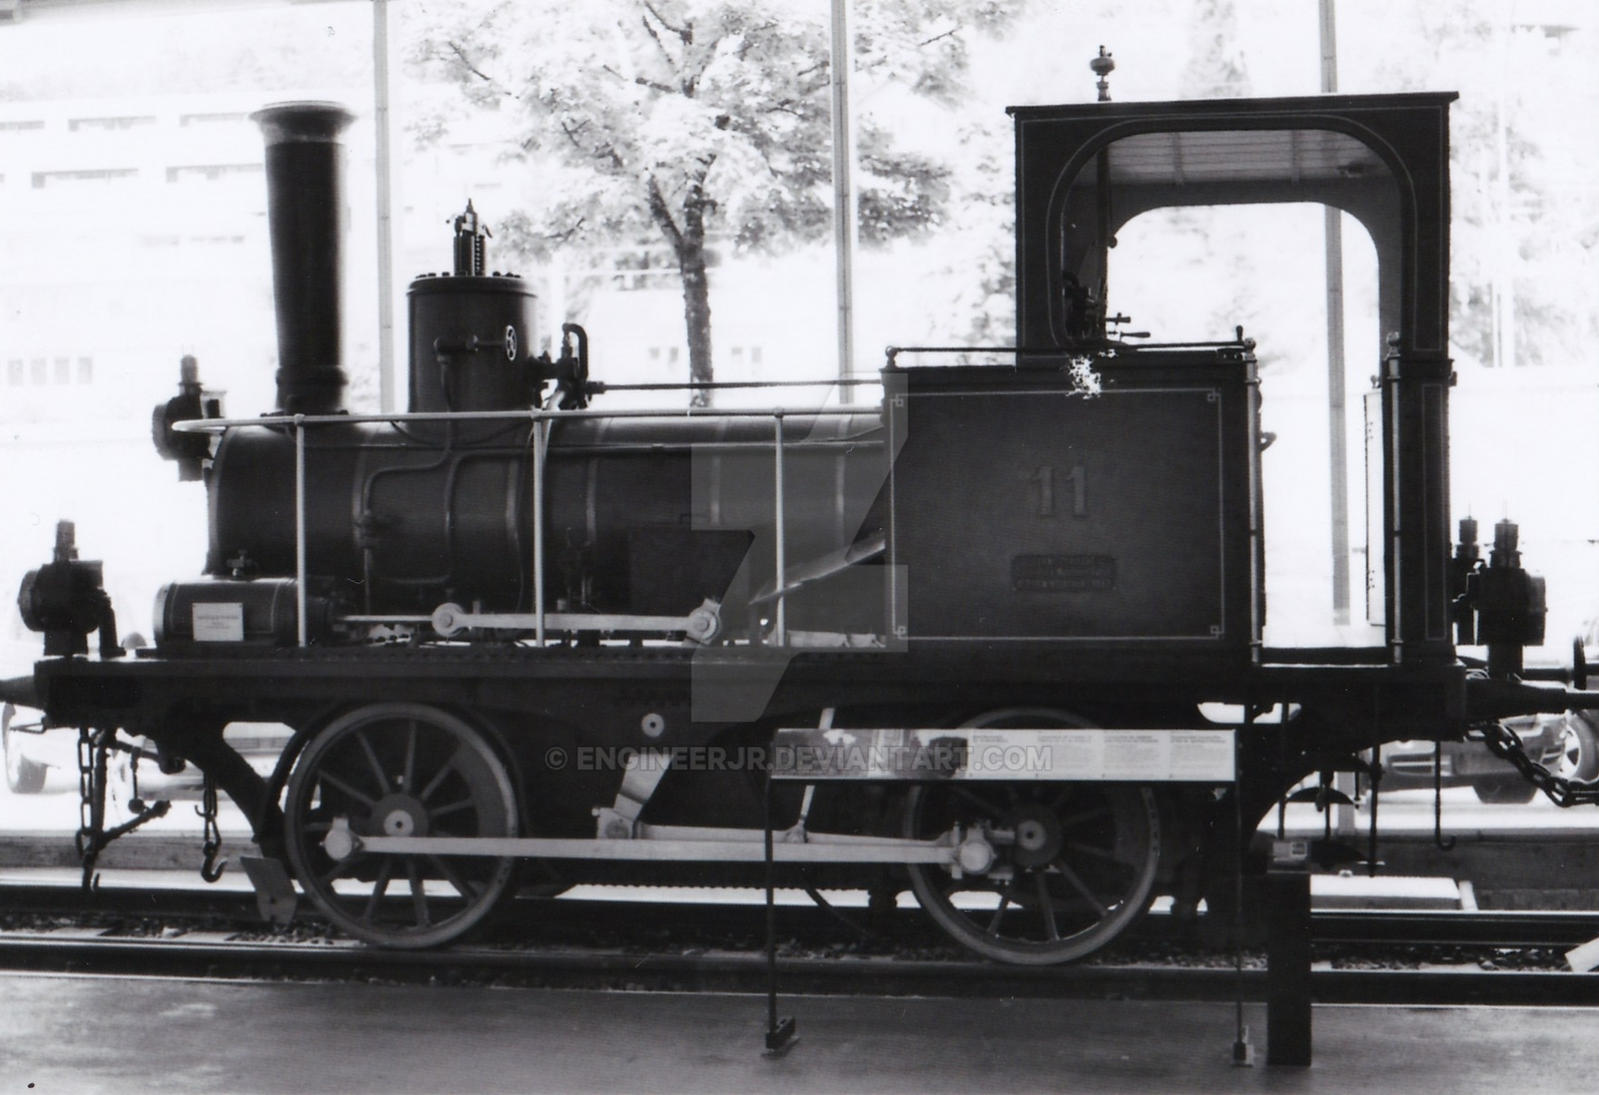 2017-09-29-EOS750-26 Swiss Museum of Transport